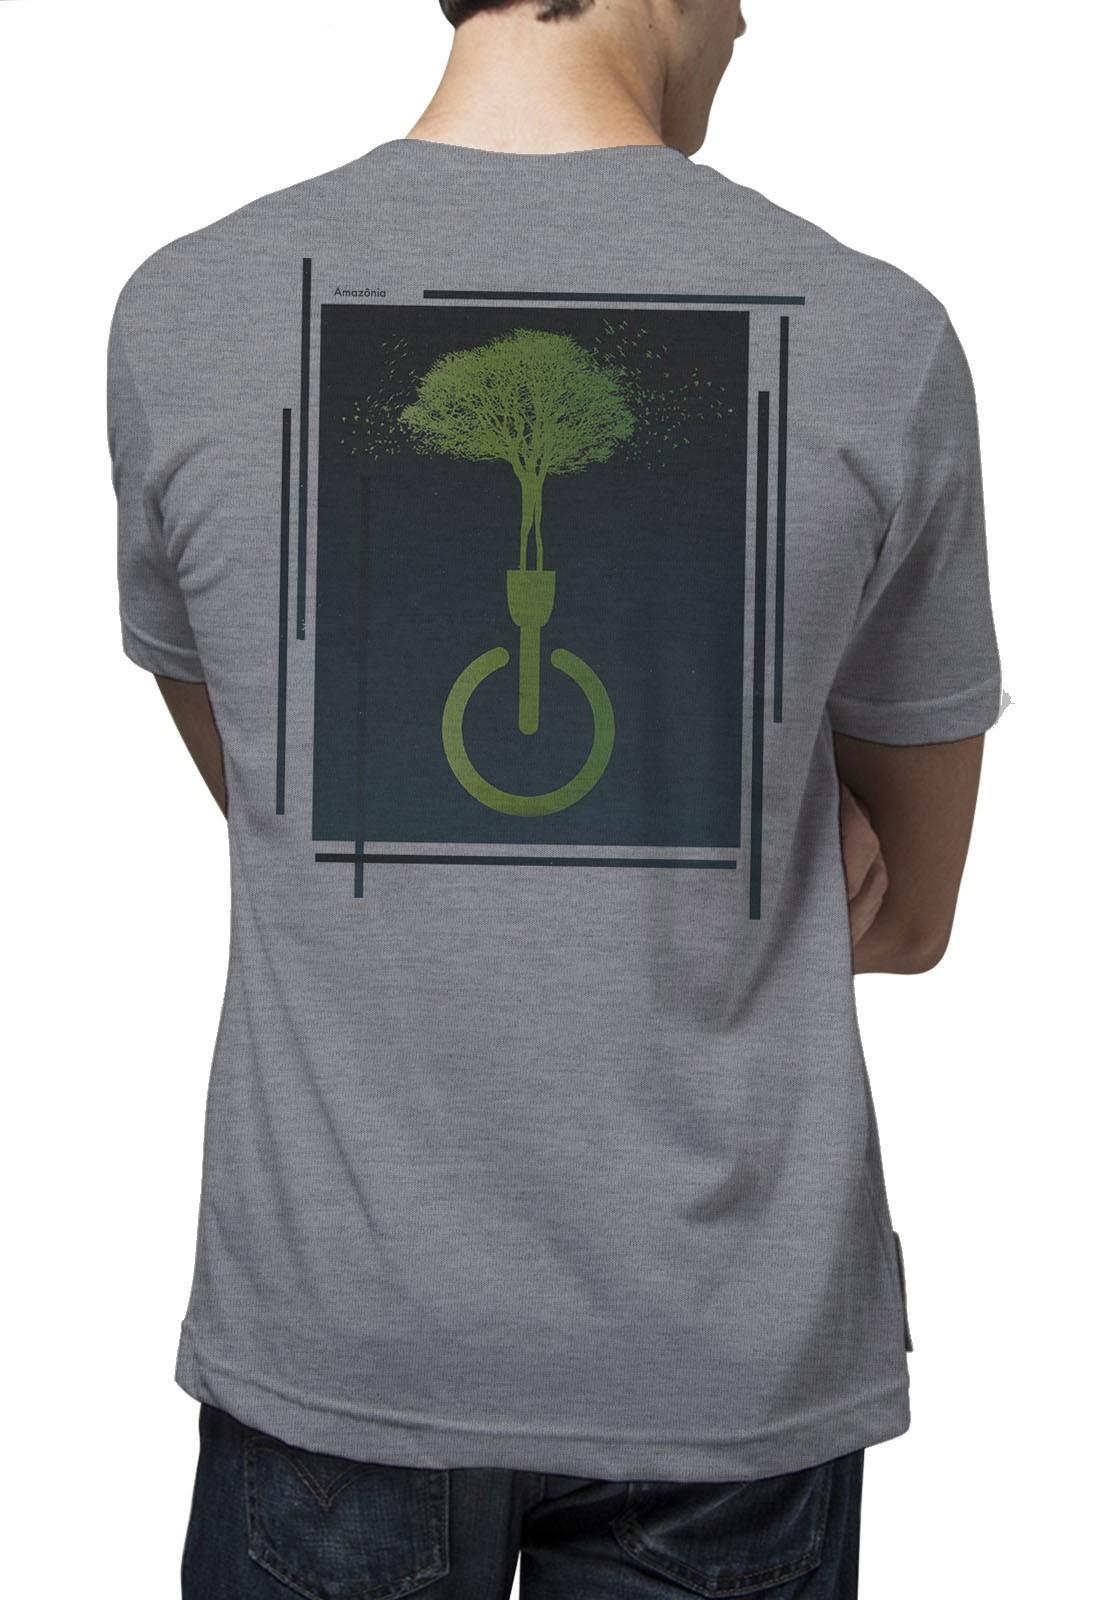 Camiseta Amazônia Luz Natureza - Mescla